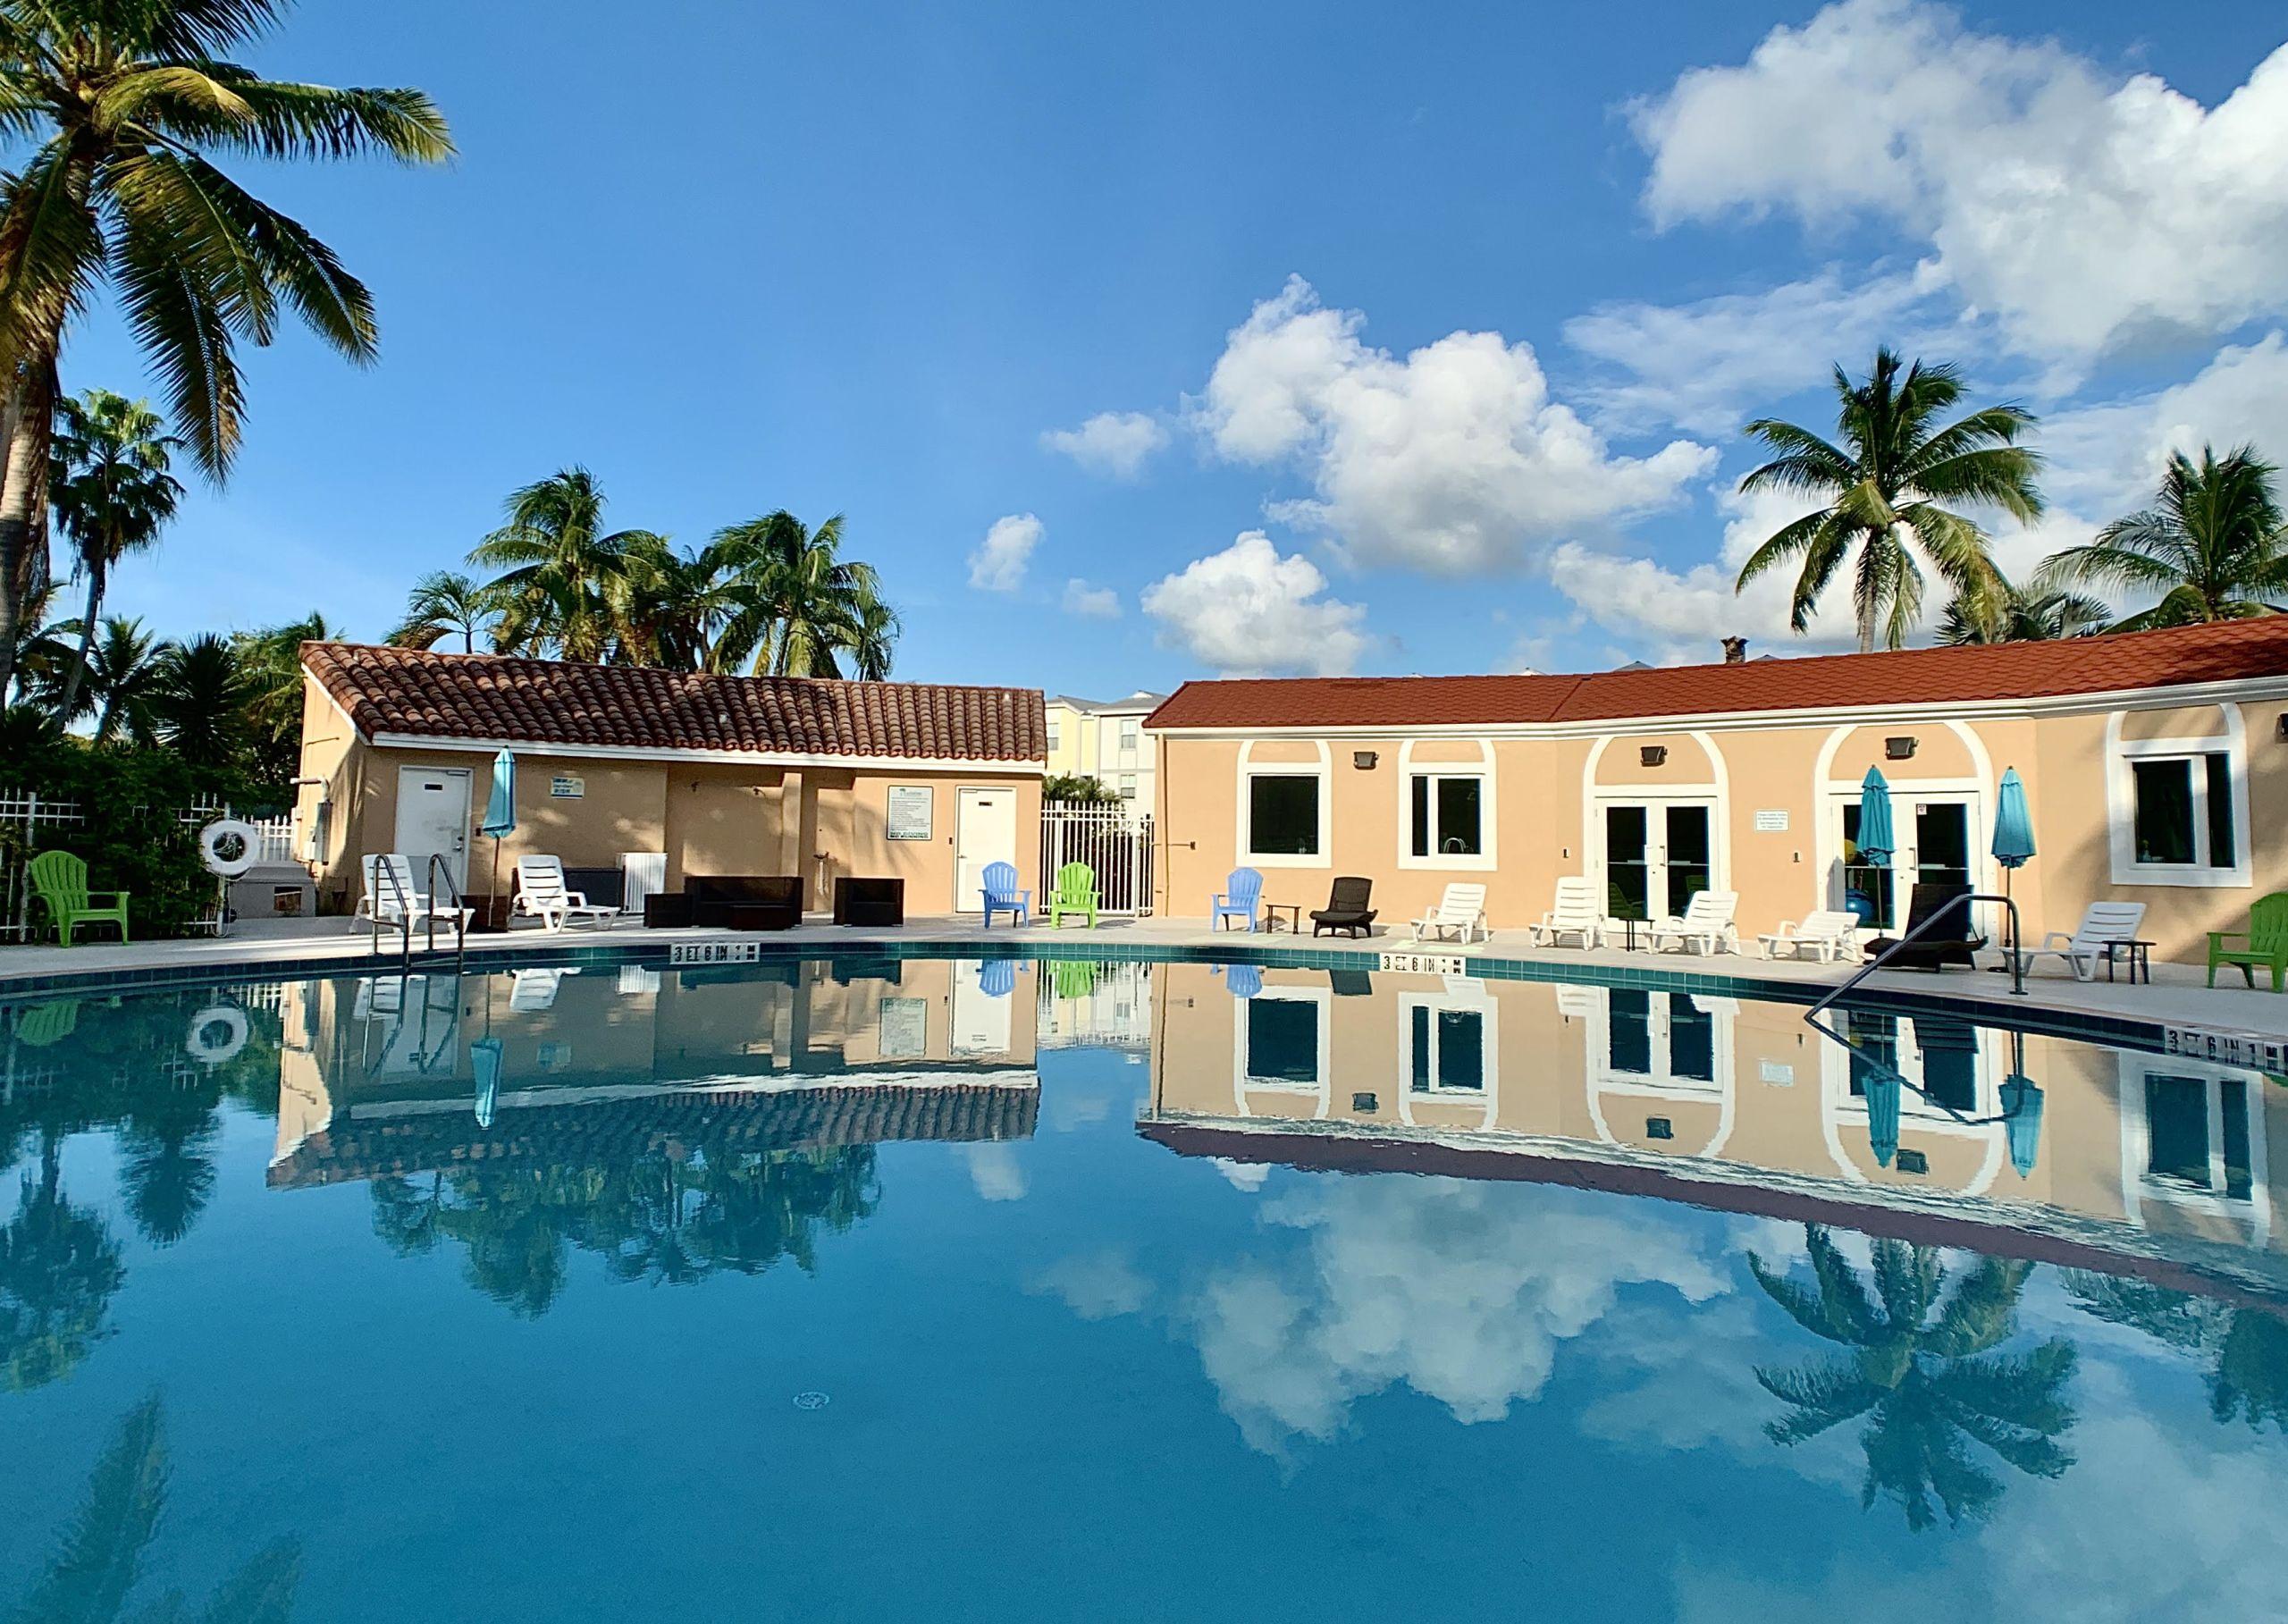 Key West 3 BR & 2 BA Only $415k